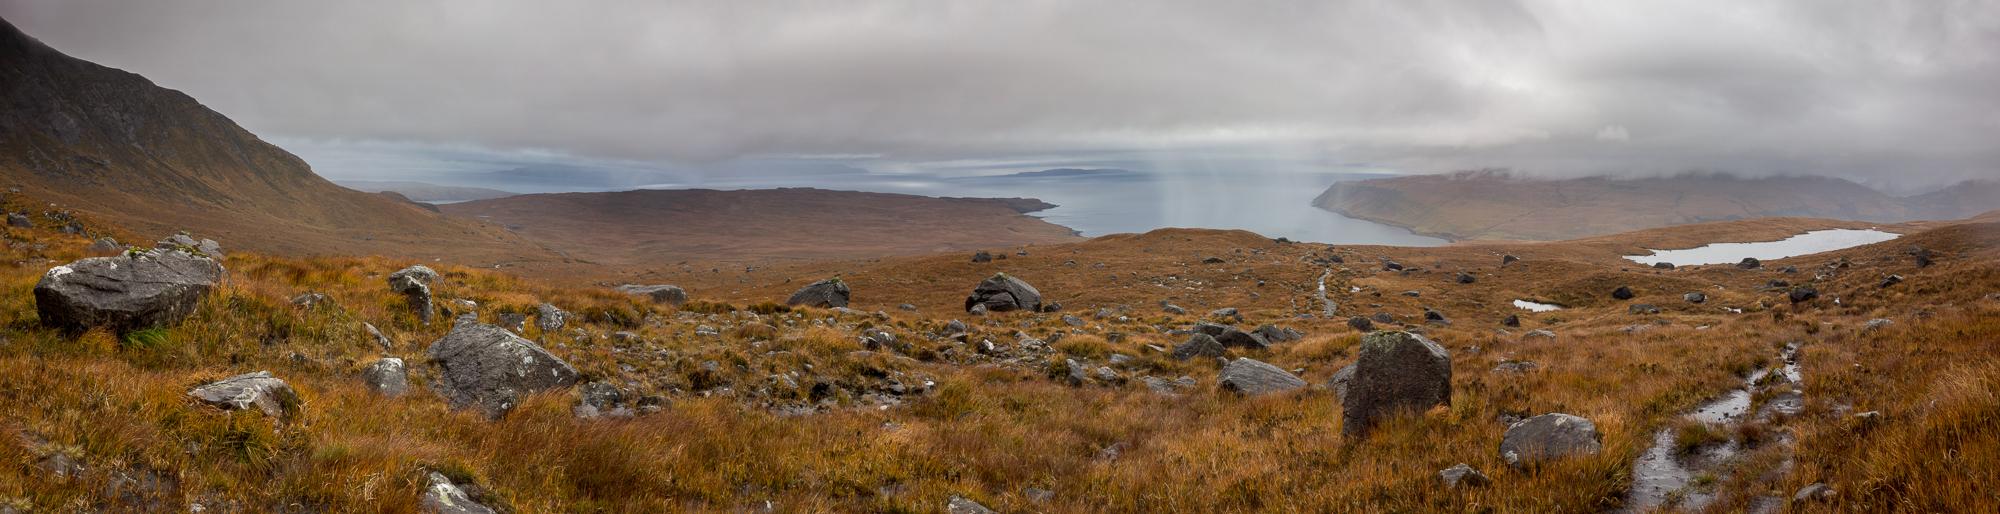 scotlandwalesweb_26.jpg